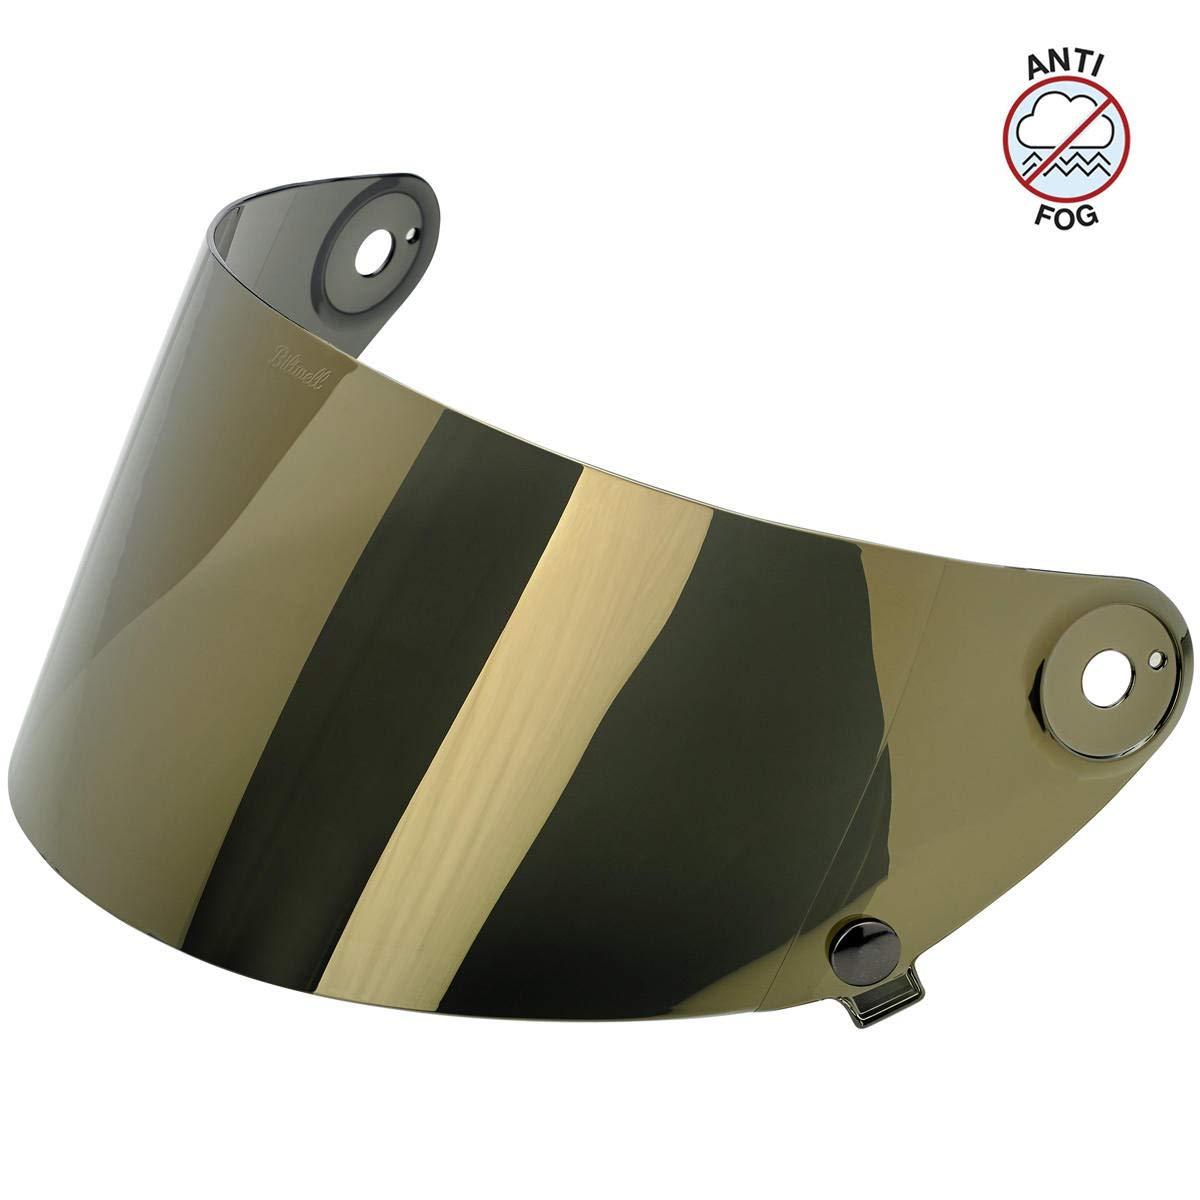 Biltwell Unisex-Adult (SA-GLD-GS-SD) Gringo S Flat Shield-Gold Mirror Anti-Fog, One Size) by Biltwell